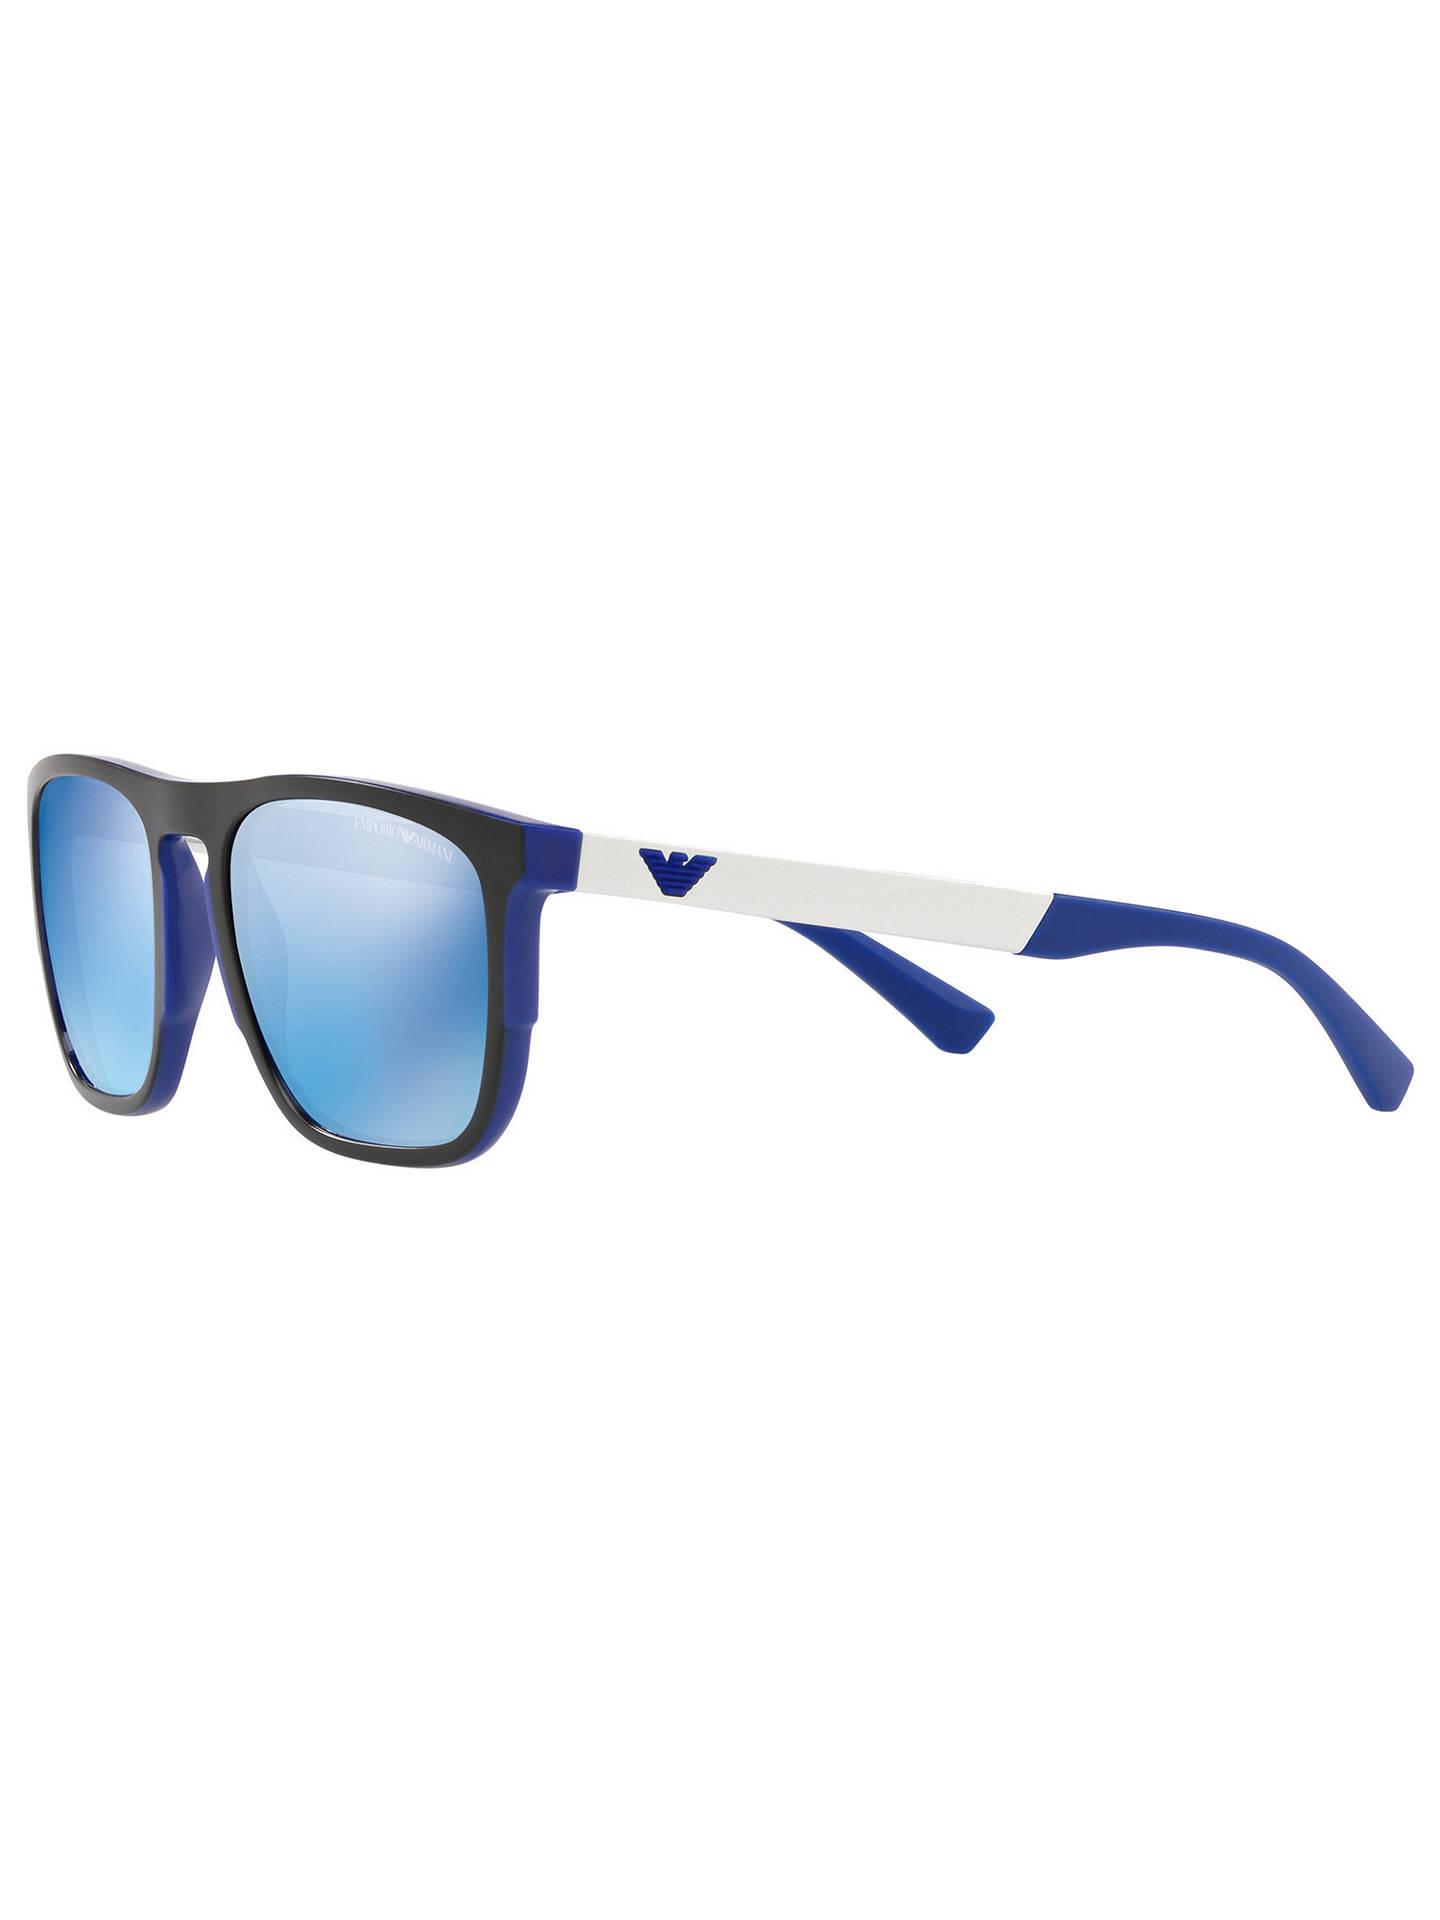 24bcf4e6d68 Emporio Armani EA4114 Men s Square Sunglasses at John Lewis   Partners